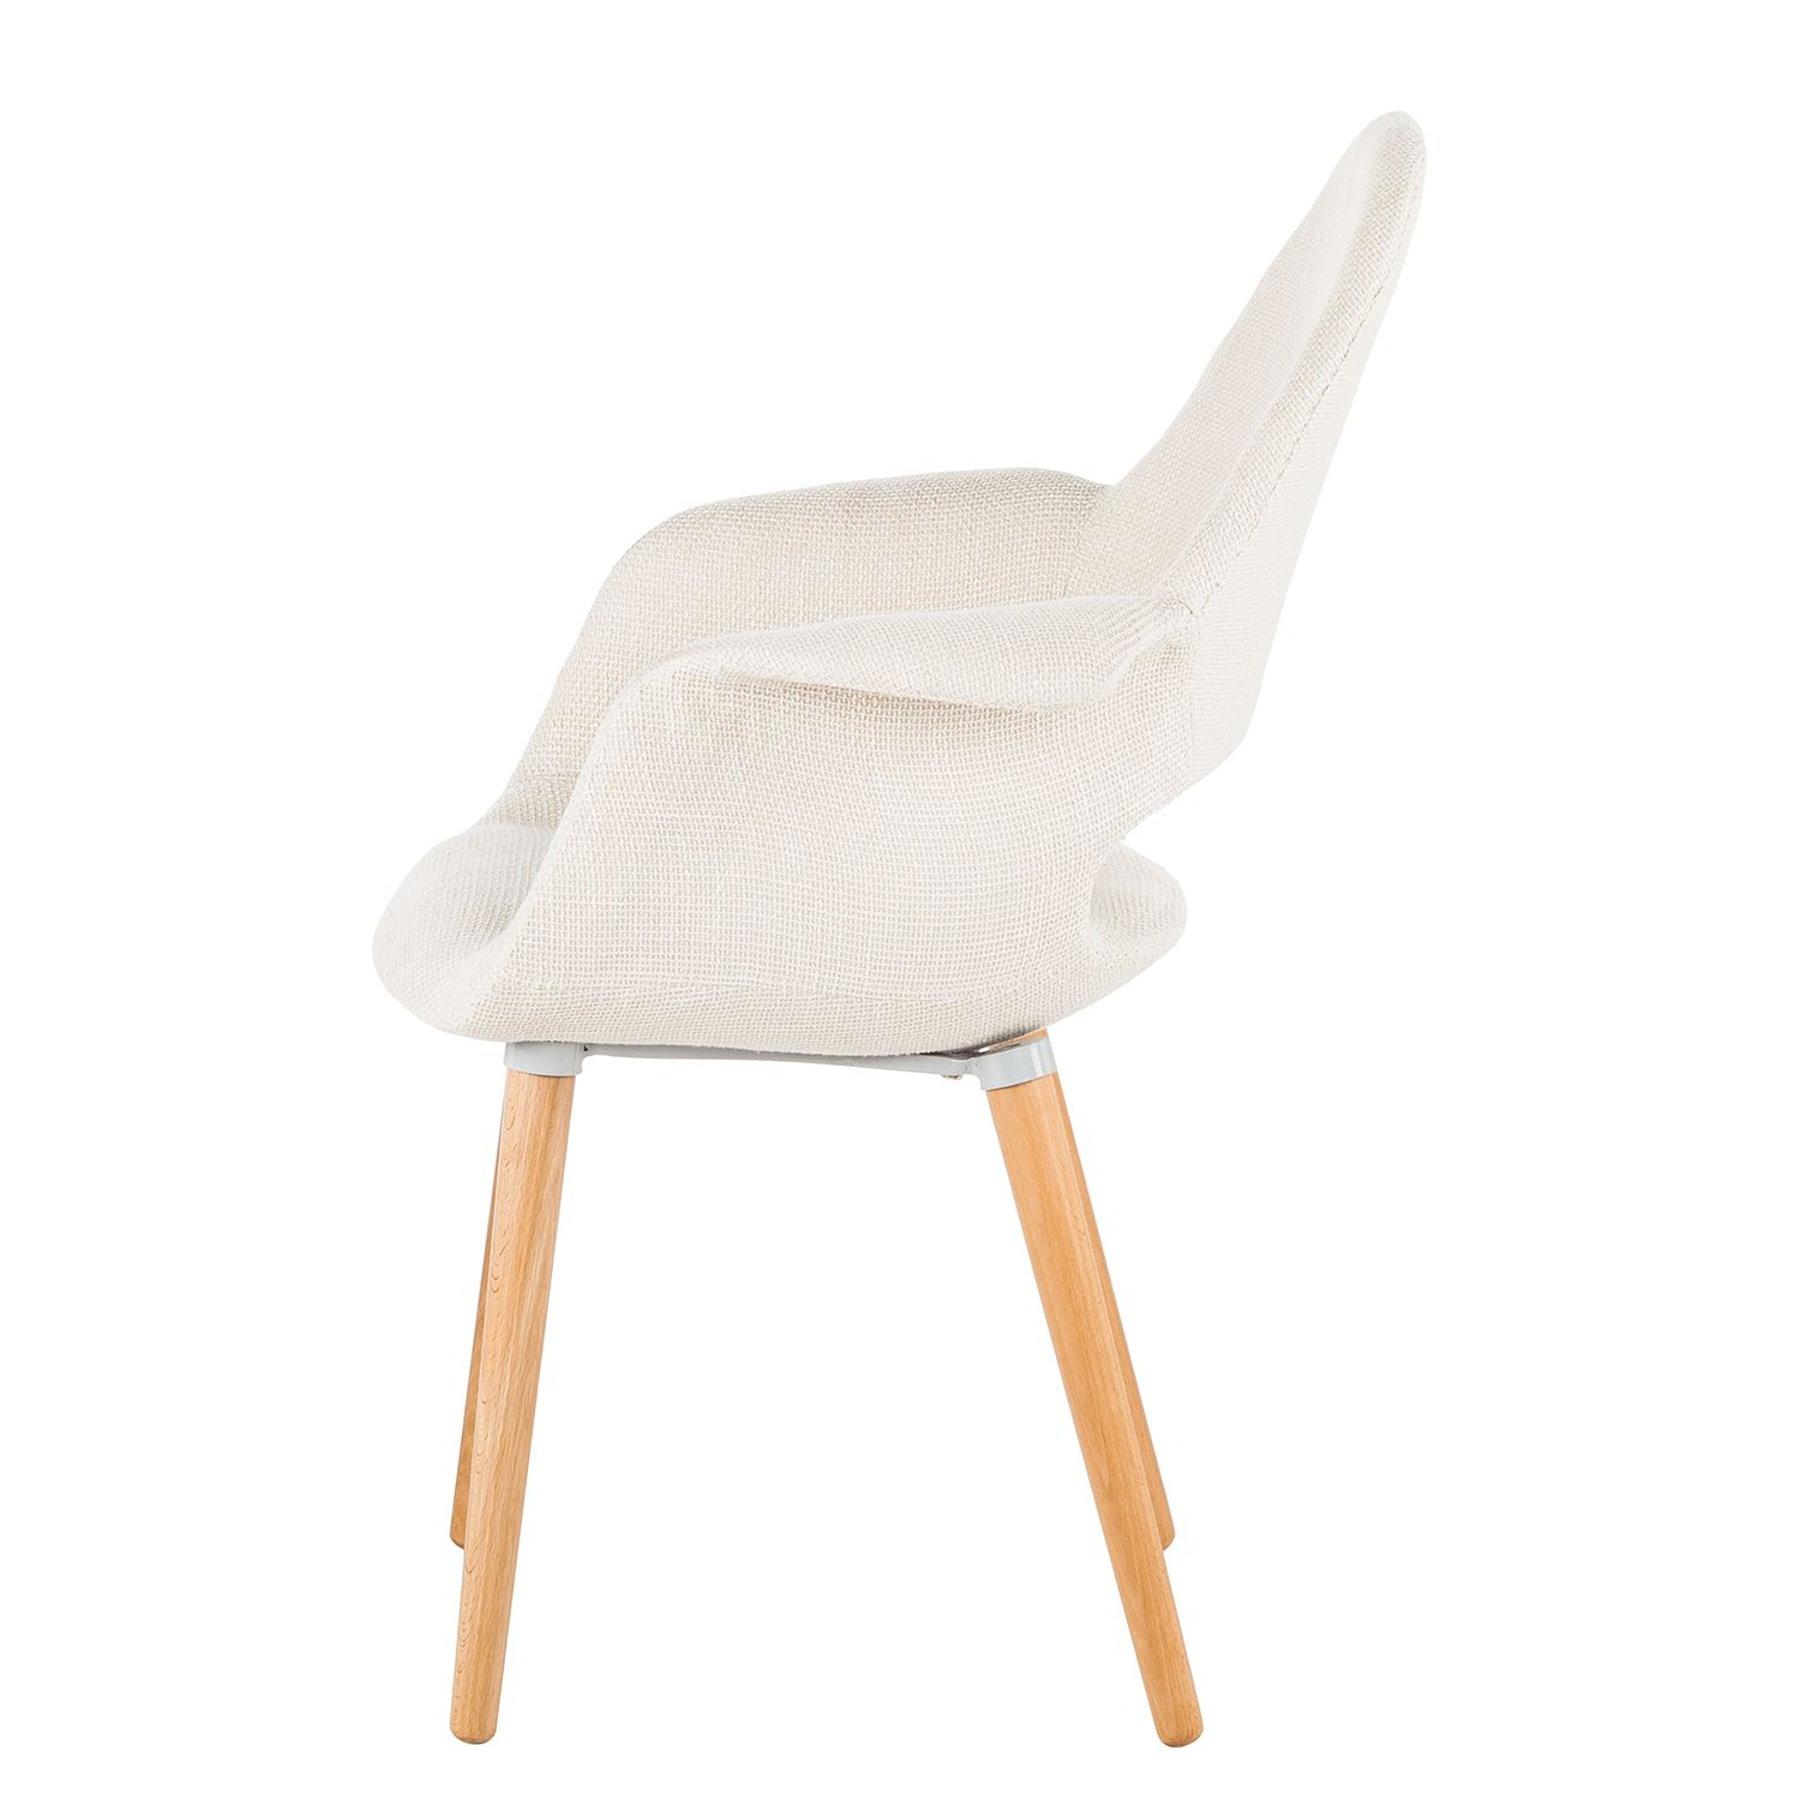 2x armlehnenstuhl beige stuhl sessel esszimmer k che polstersessel polsterstuhl ebay. Black Bedroom Furniture Sets. Home Design Ideas